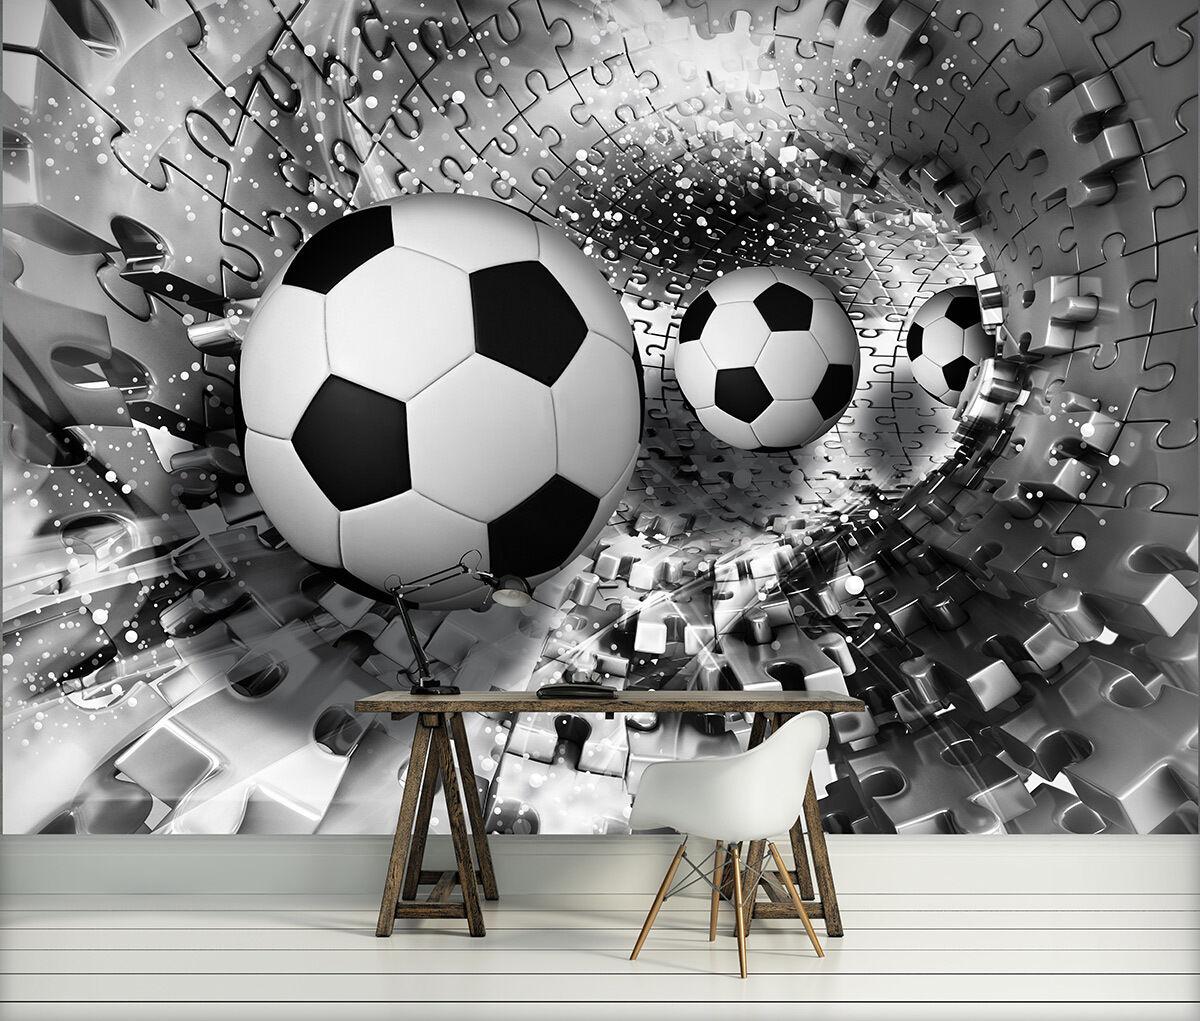 VLIES Fototapete Bild Poster Foto Tapeten SCHWARZ SPORT BALL 3D PUZZLE 3FX3382VE